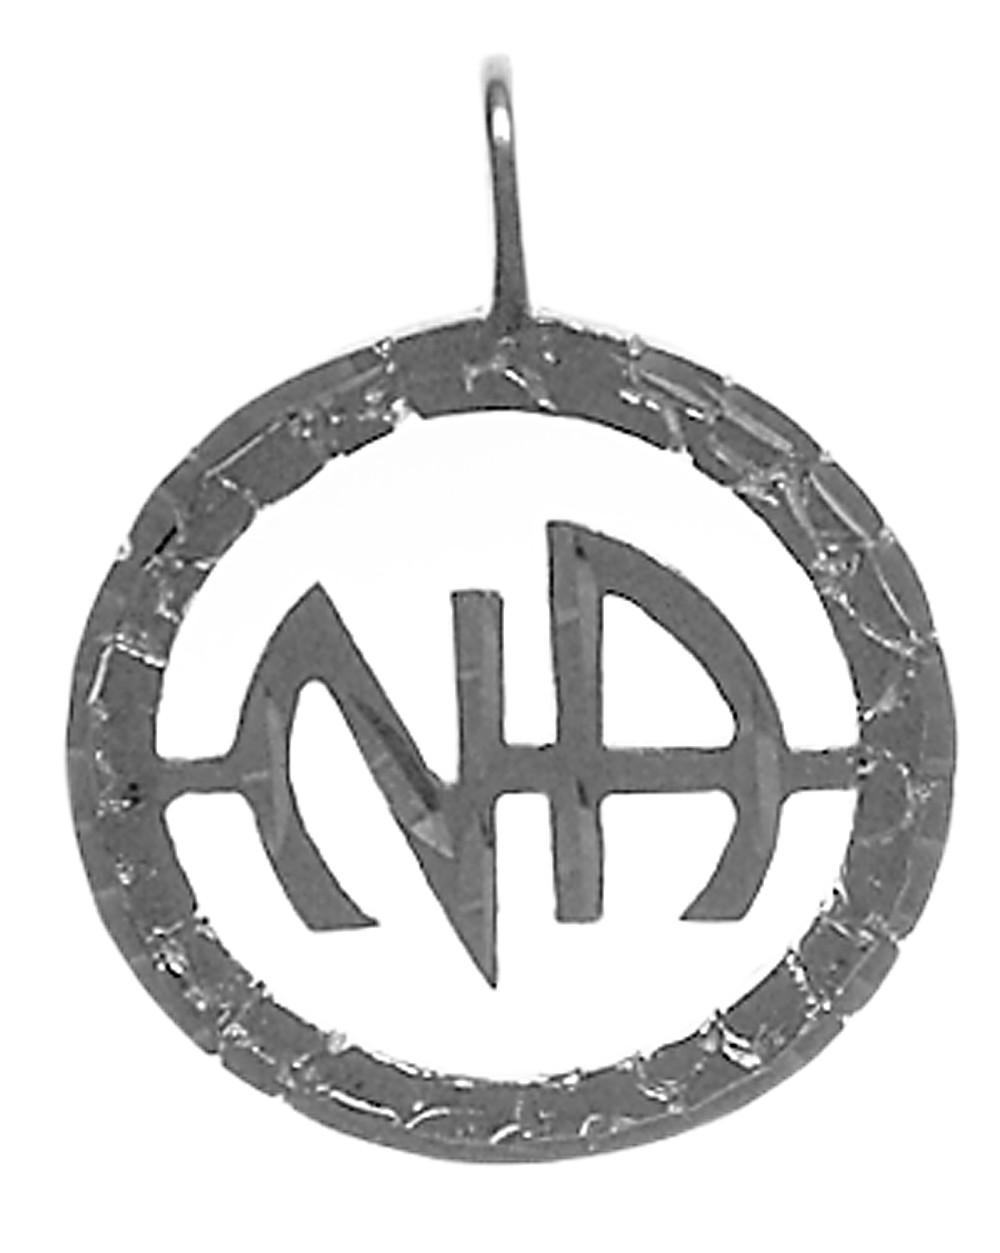 Sterling silver na initials pendant circlenasymbolpendantg aloadofball Image collections